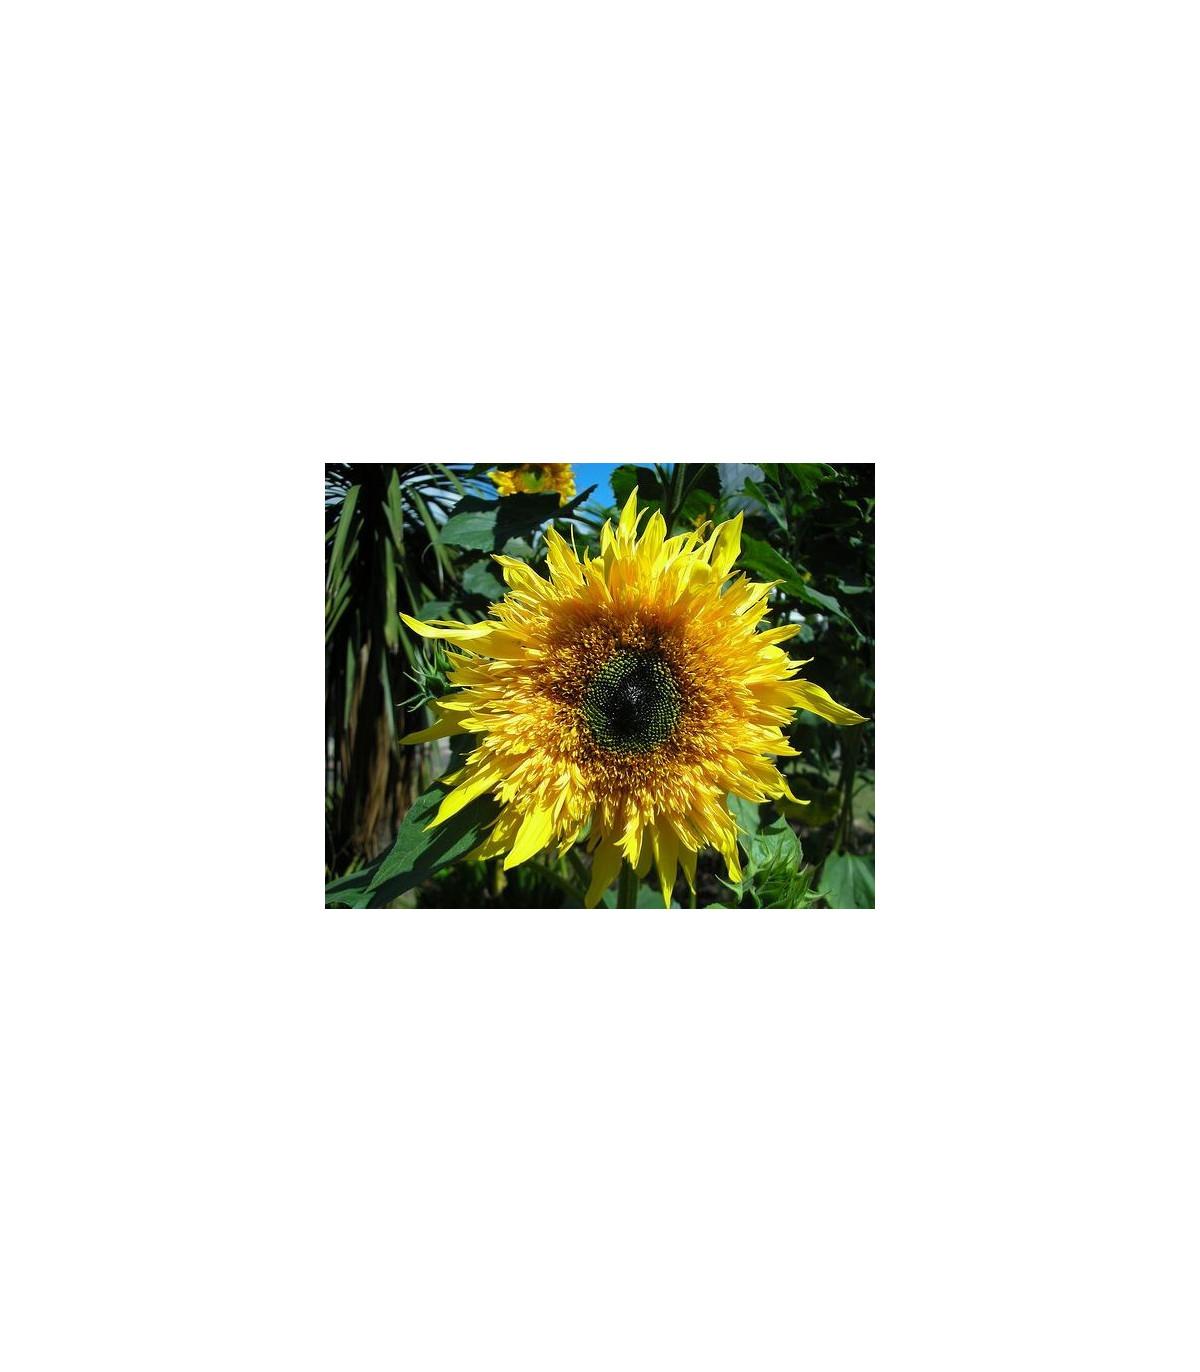 Slunečnice F1 Surprise - Helianthus annuus- semena Slunečnice - 7 ks